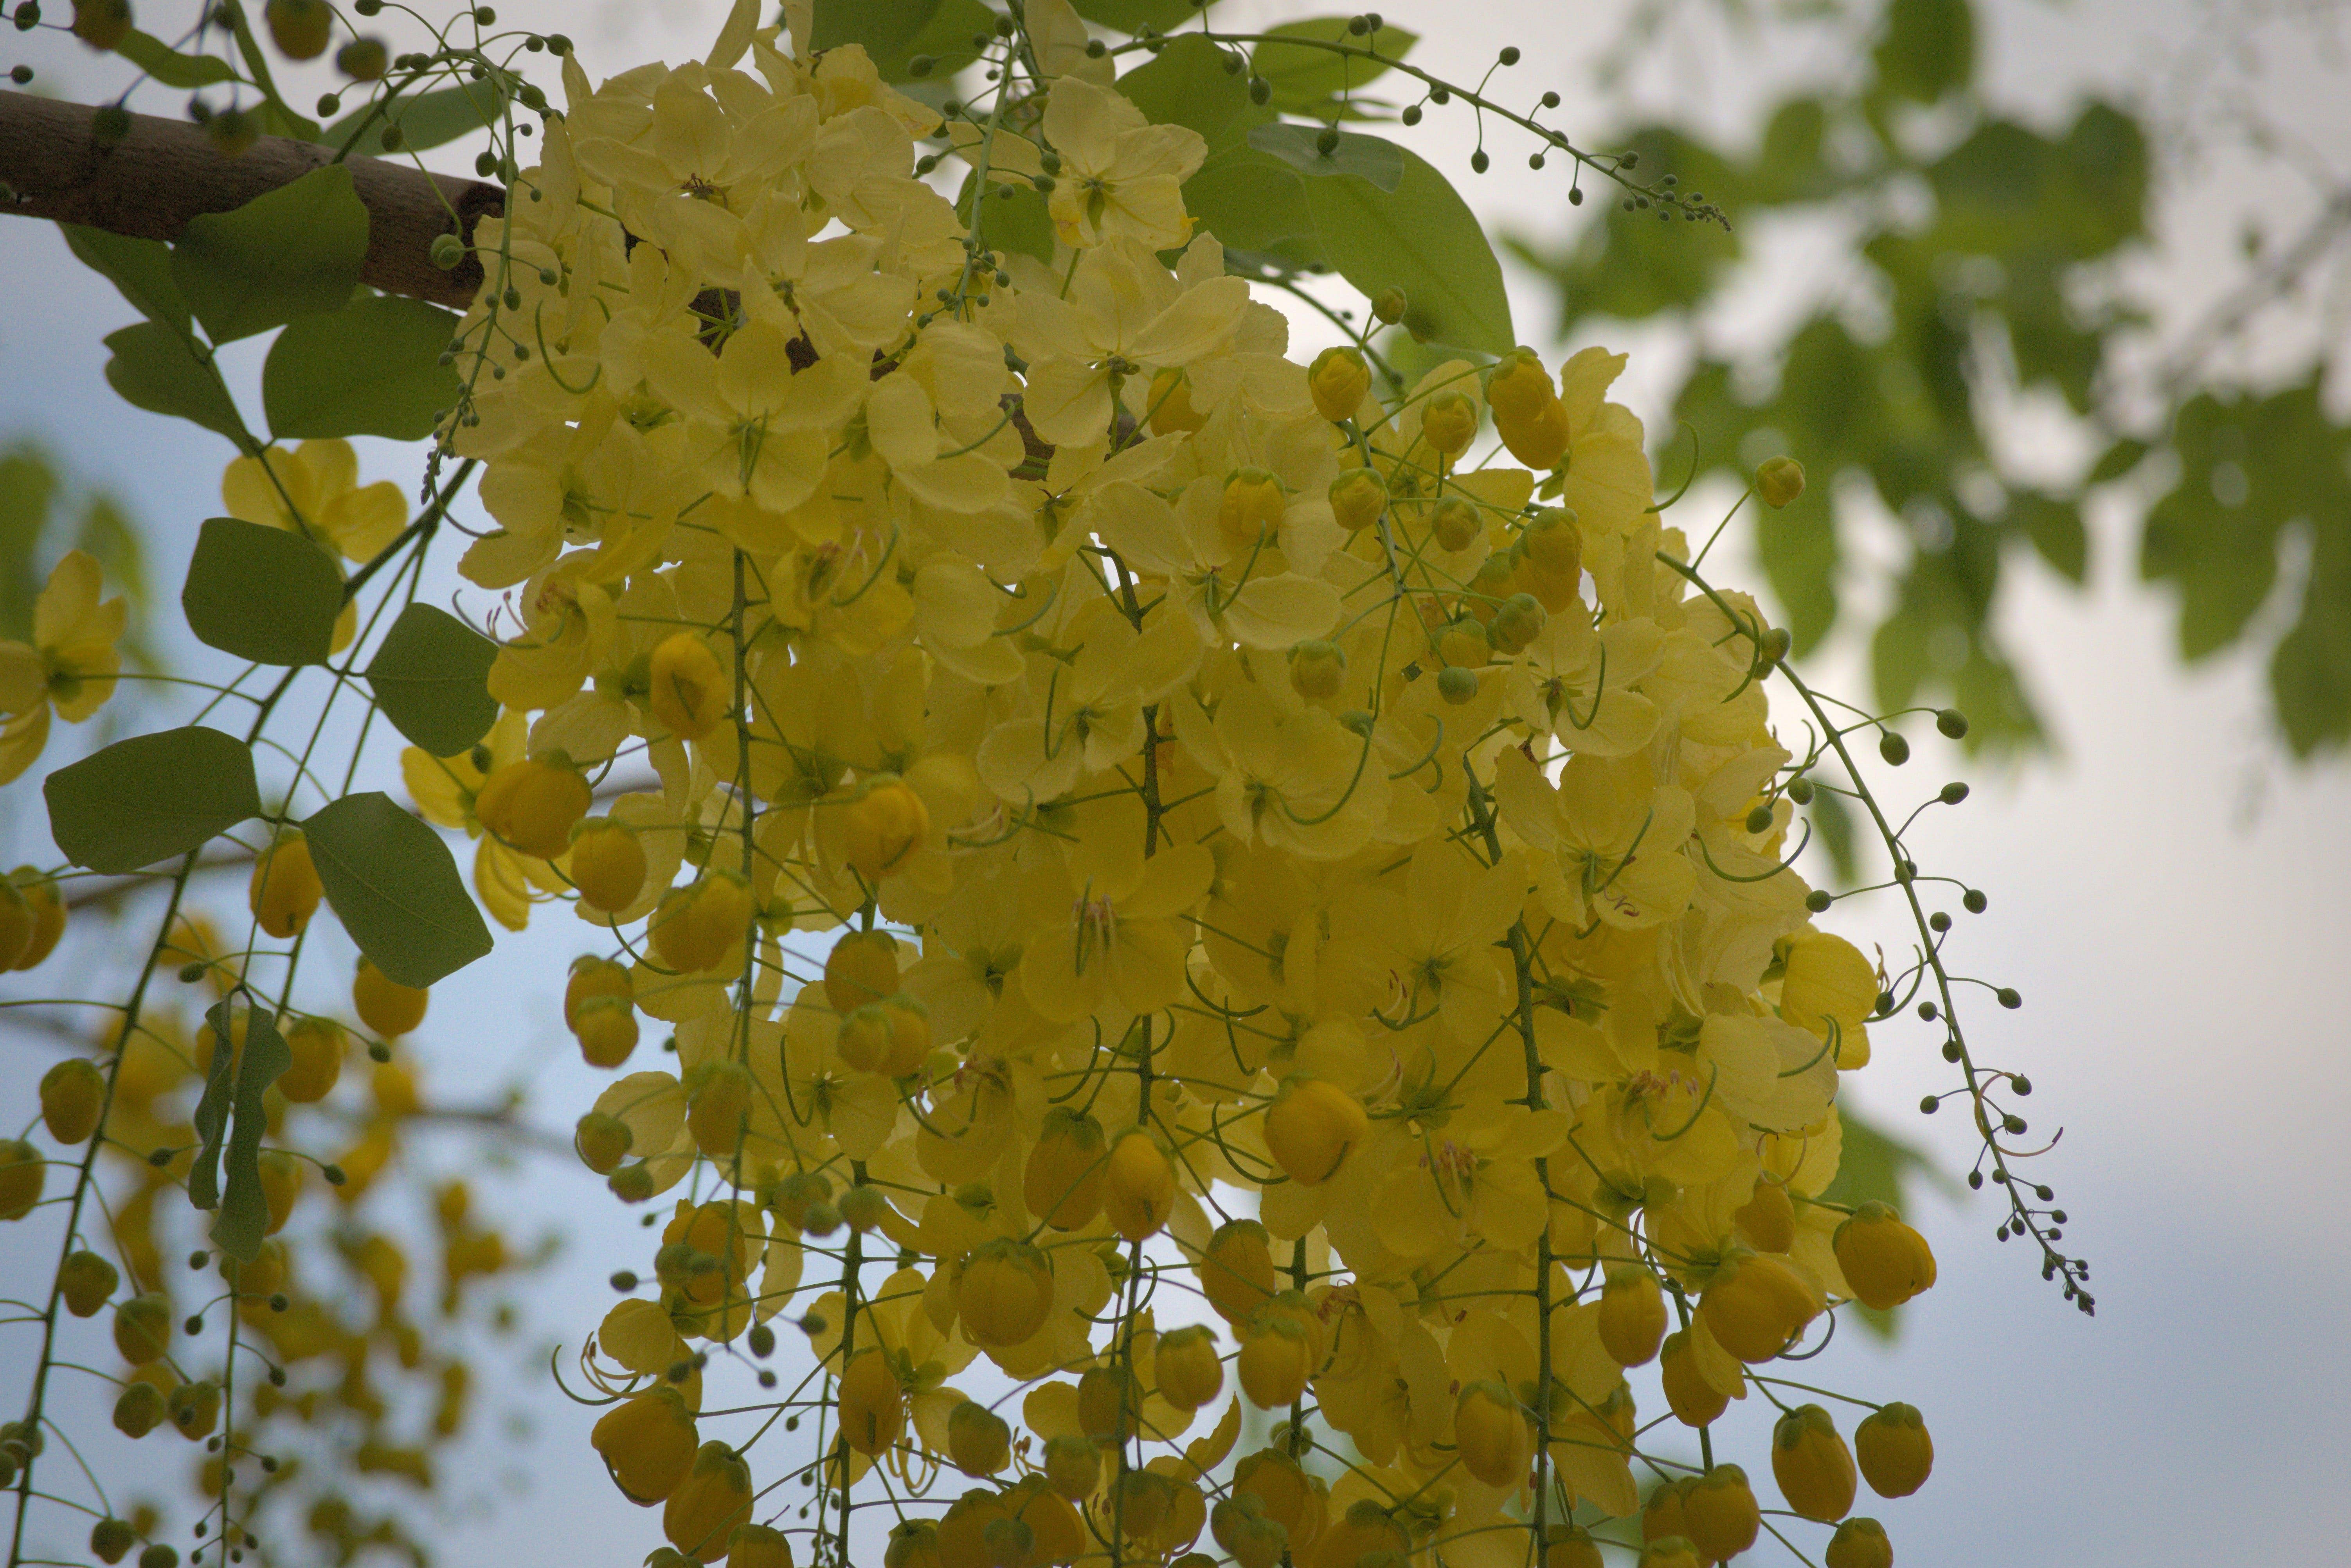 canafistula, Cassia Fistula, Golden rain tree